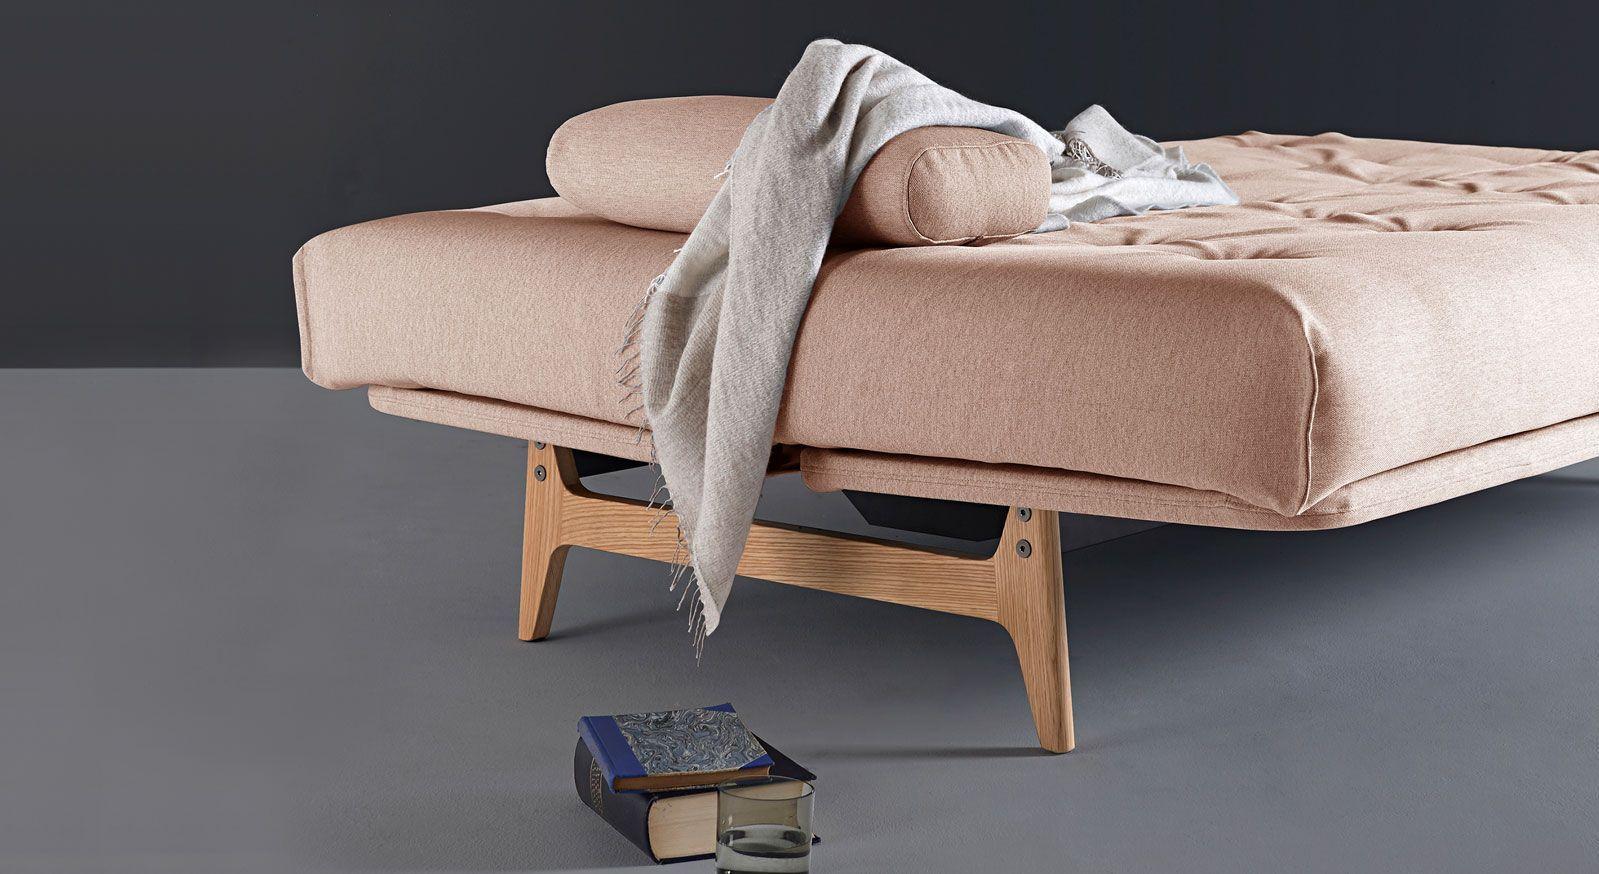 Schlafsofa Lamond mit Stoffbezug aus Soft in Korall